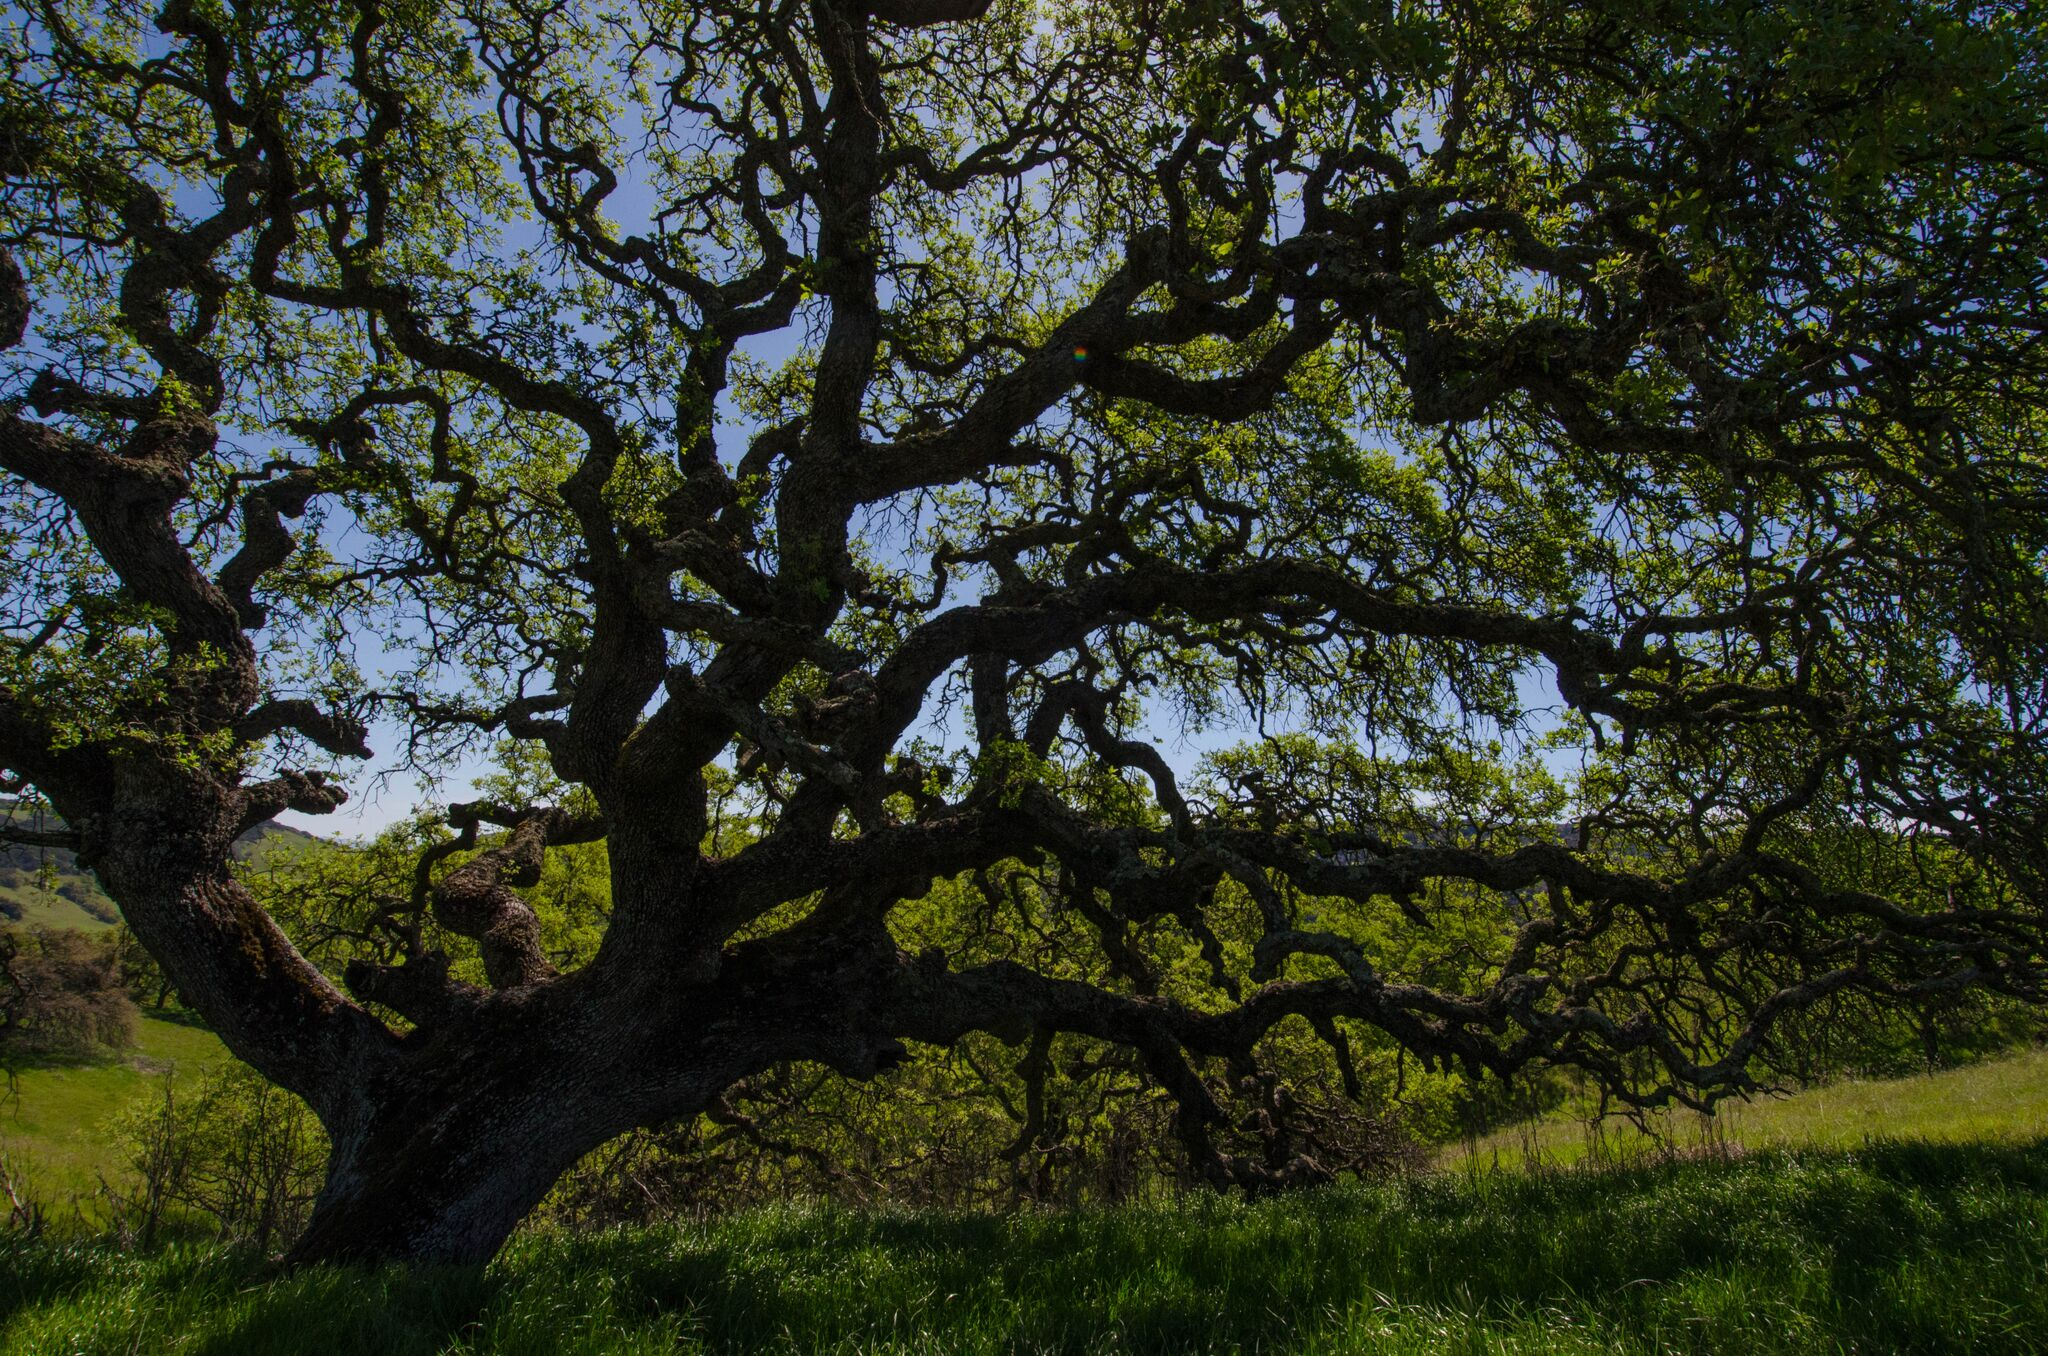 Mayfair-Trail_Rancho-Canada-del-Oro-Open-Space-Preserve_Cassie-Kifer-30_preview